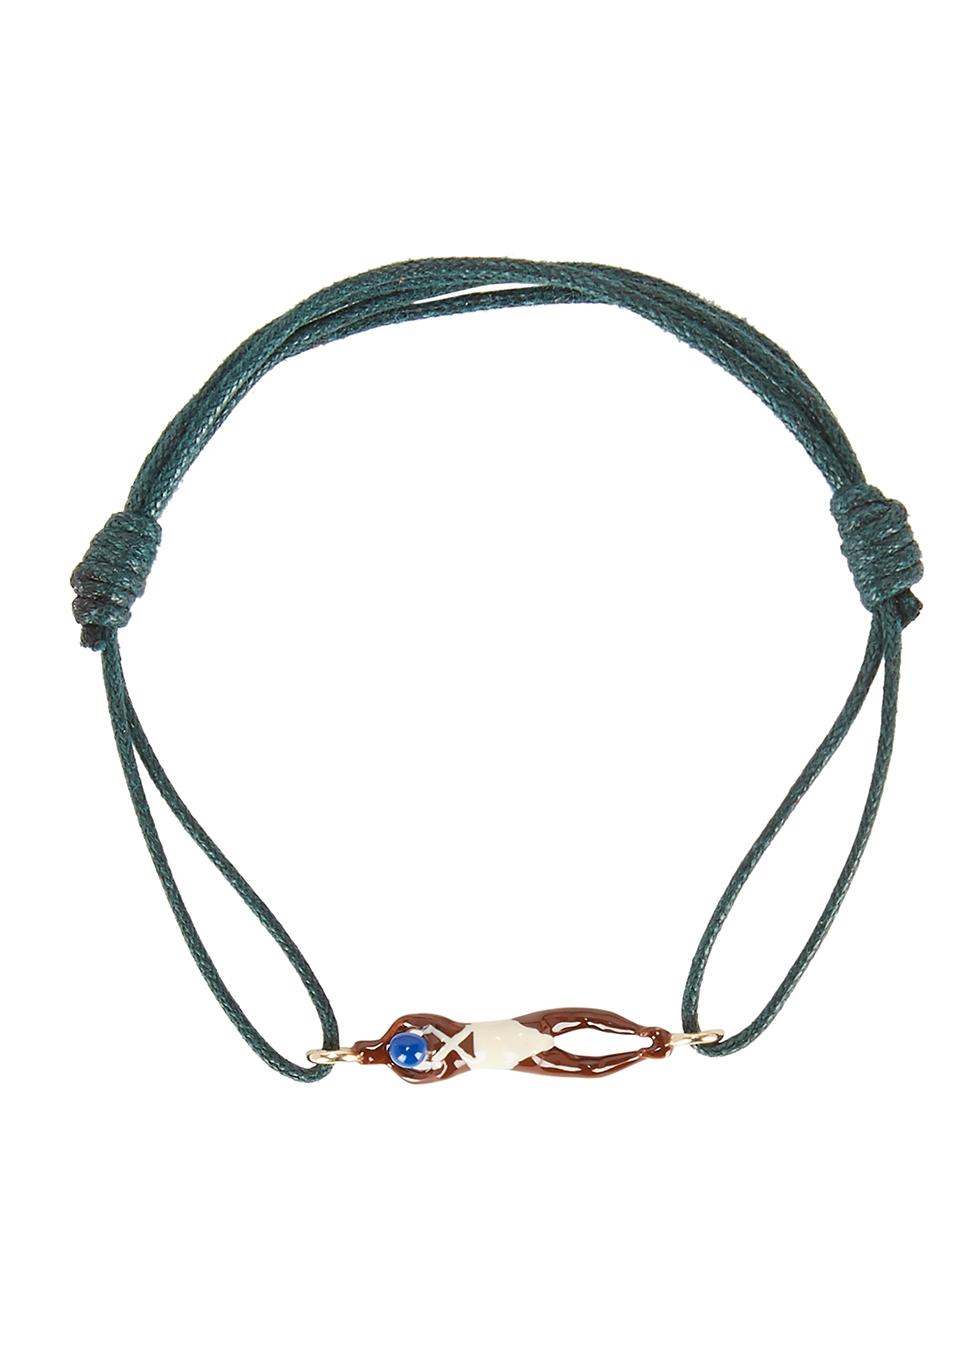 Nadadora Completo green cord bracelet